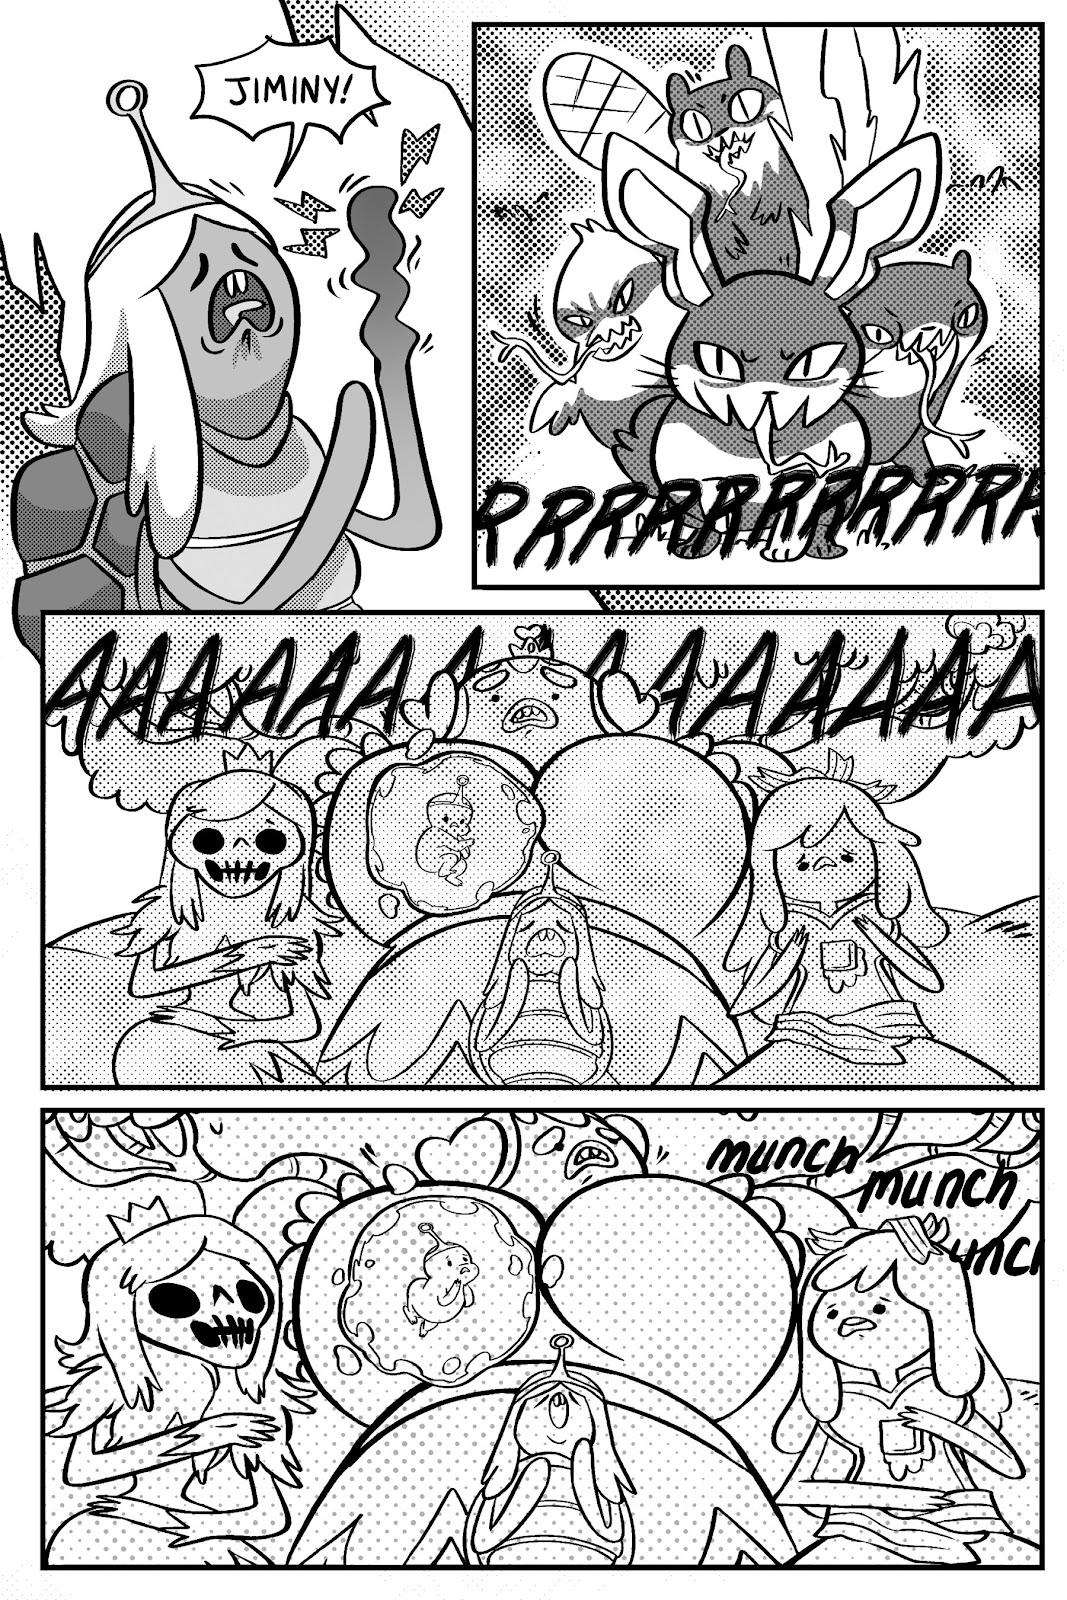 Read online Adventure Time: Pixel Princesses comic -  Issue # Full - 96